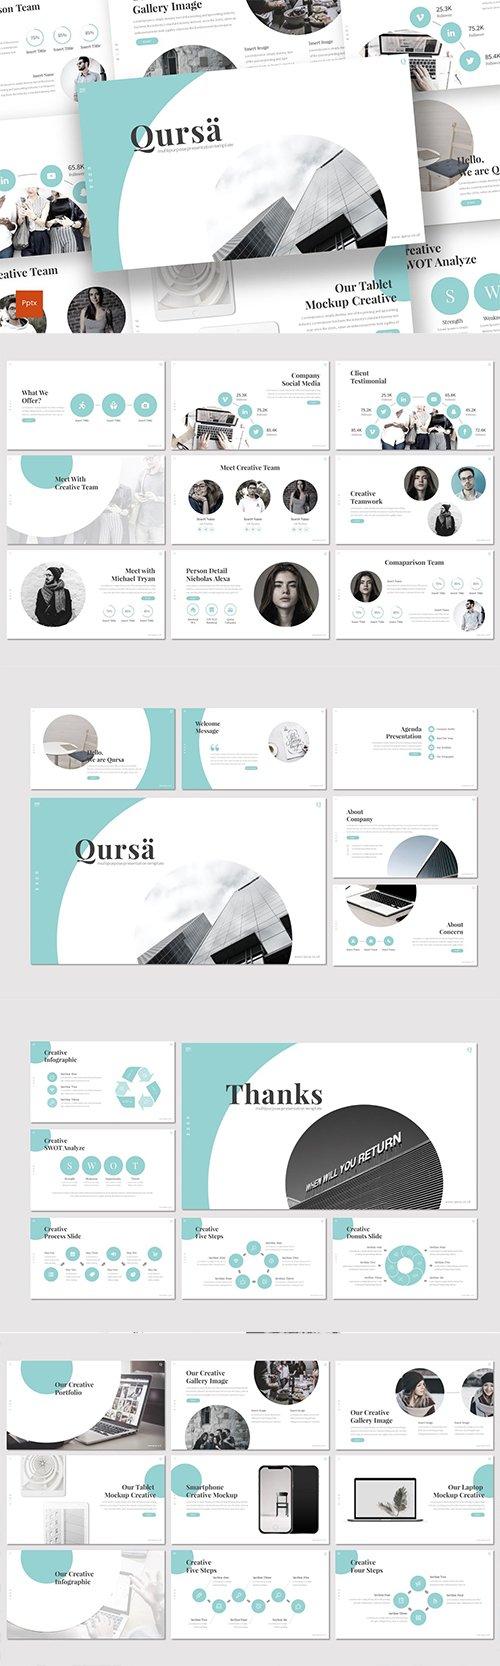 Qursa - Powerpoint Google Slides and Keynote Templates